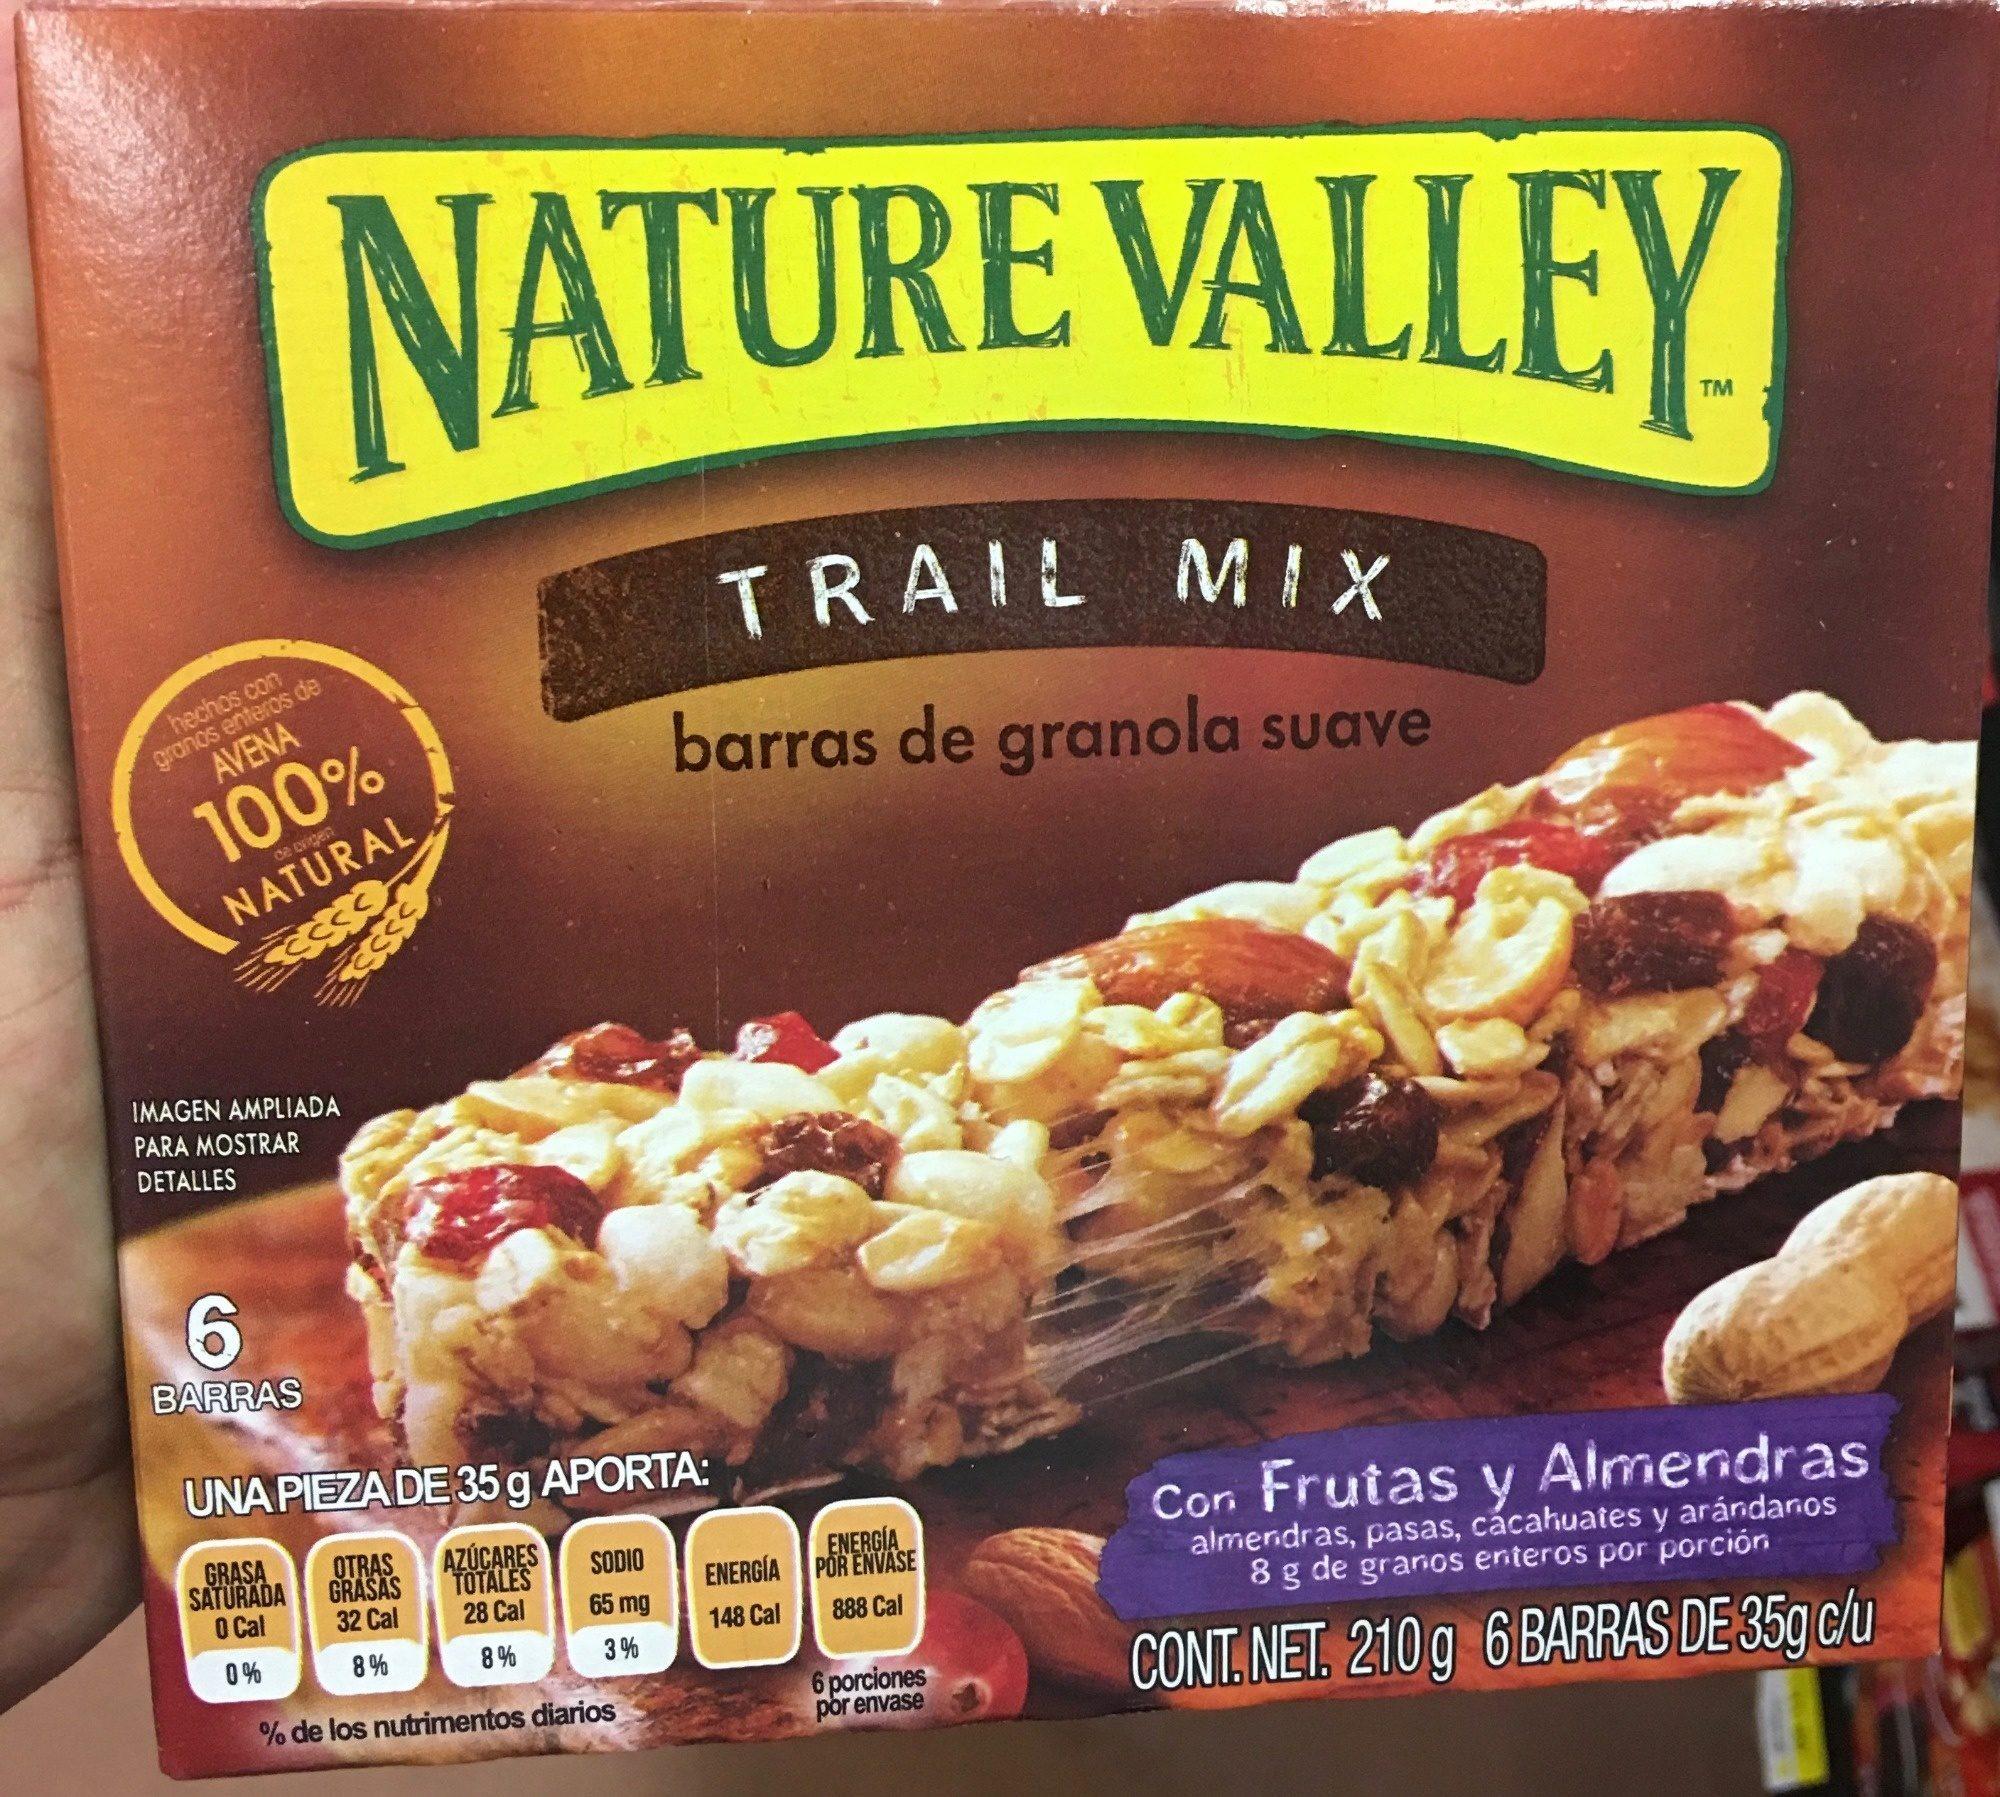 Trail Mix barras de granola suave - Product - es